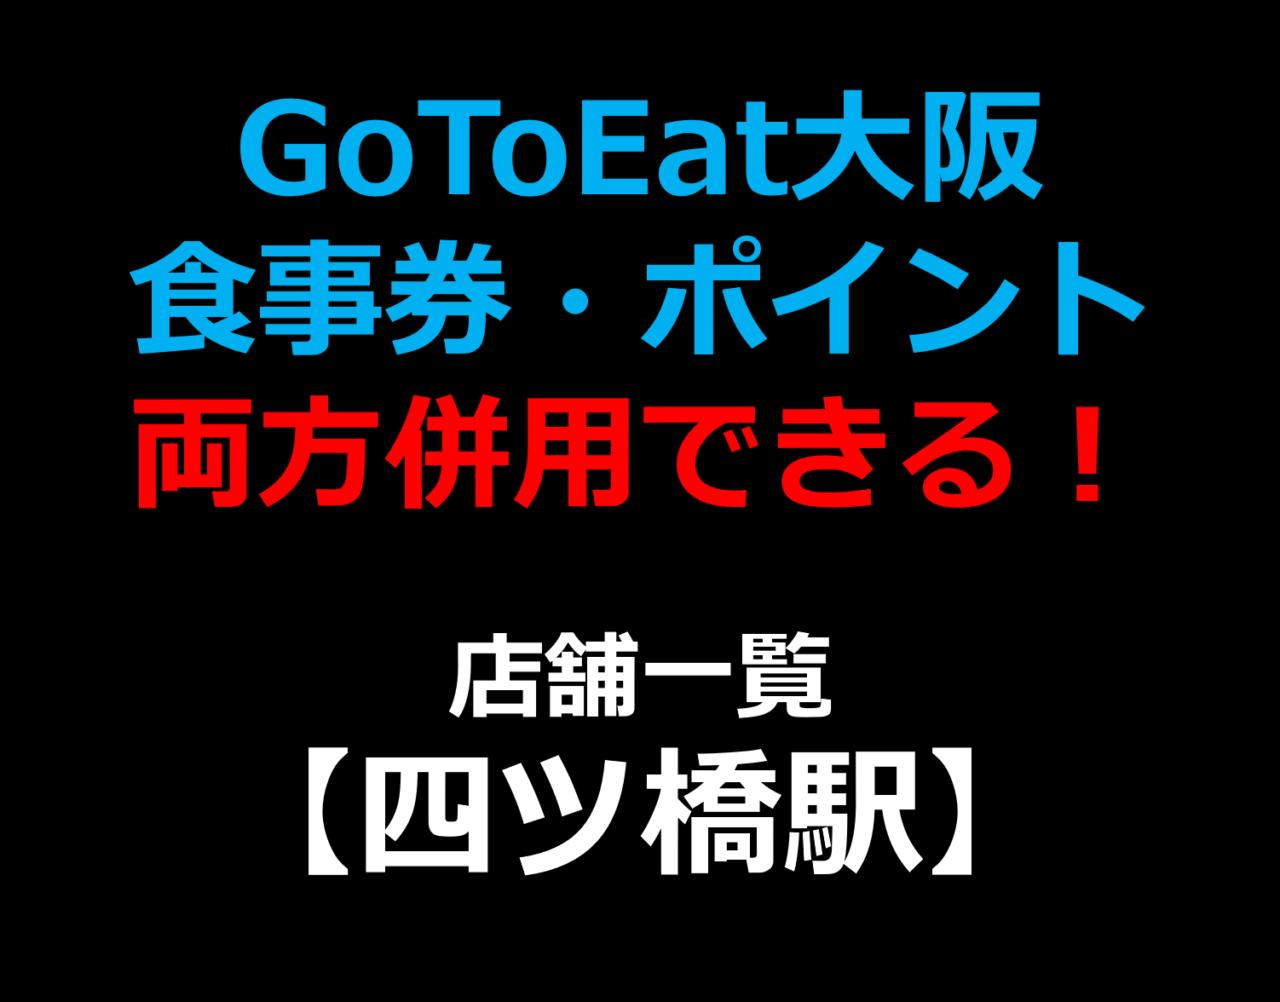 GoToEat大阪で食事券・予約サイトのポイント両方併用できる!使える!店舗一覧 【四ツ橋駅】